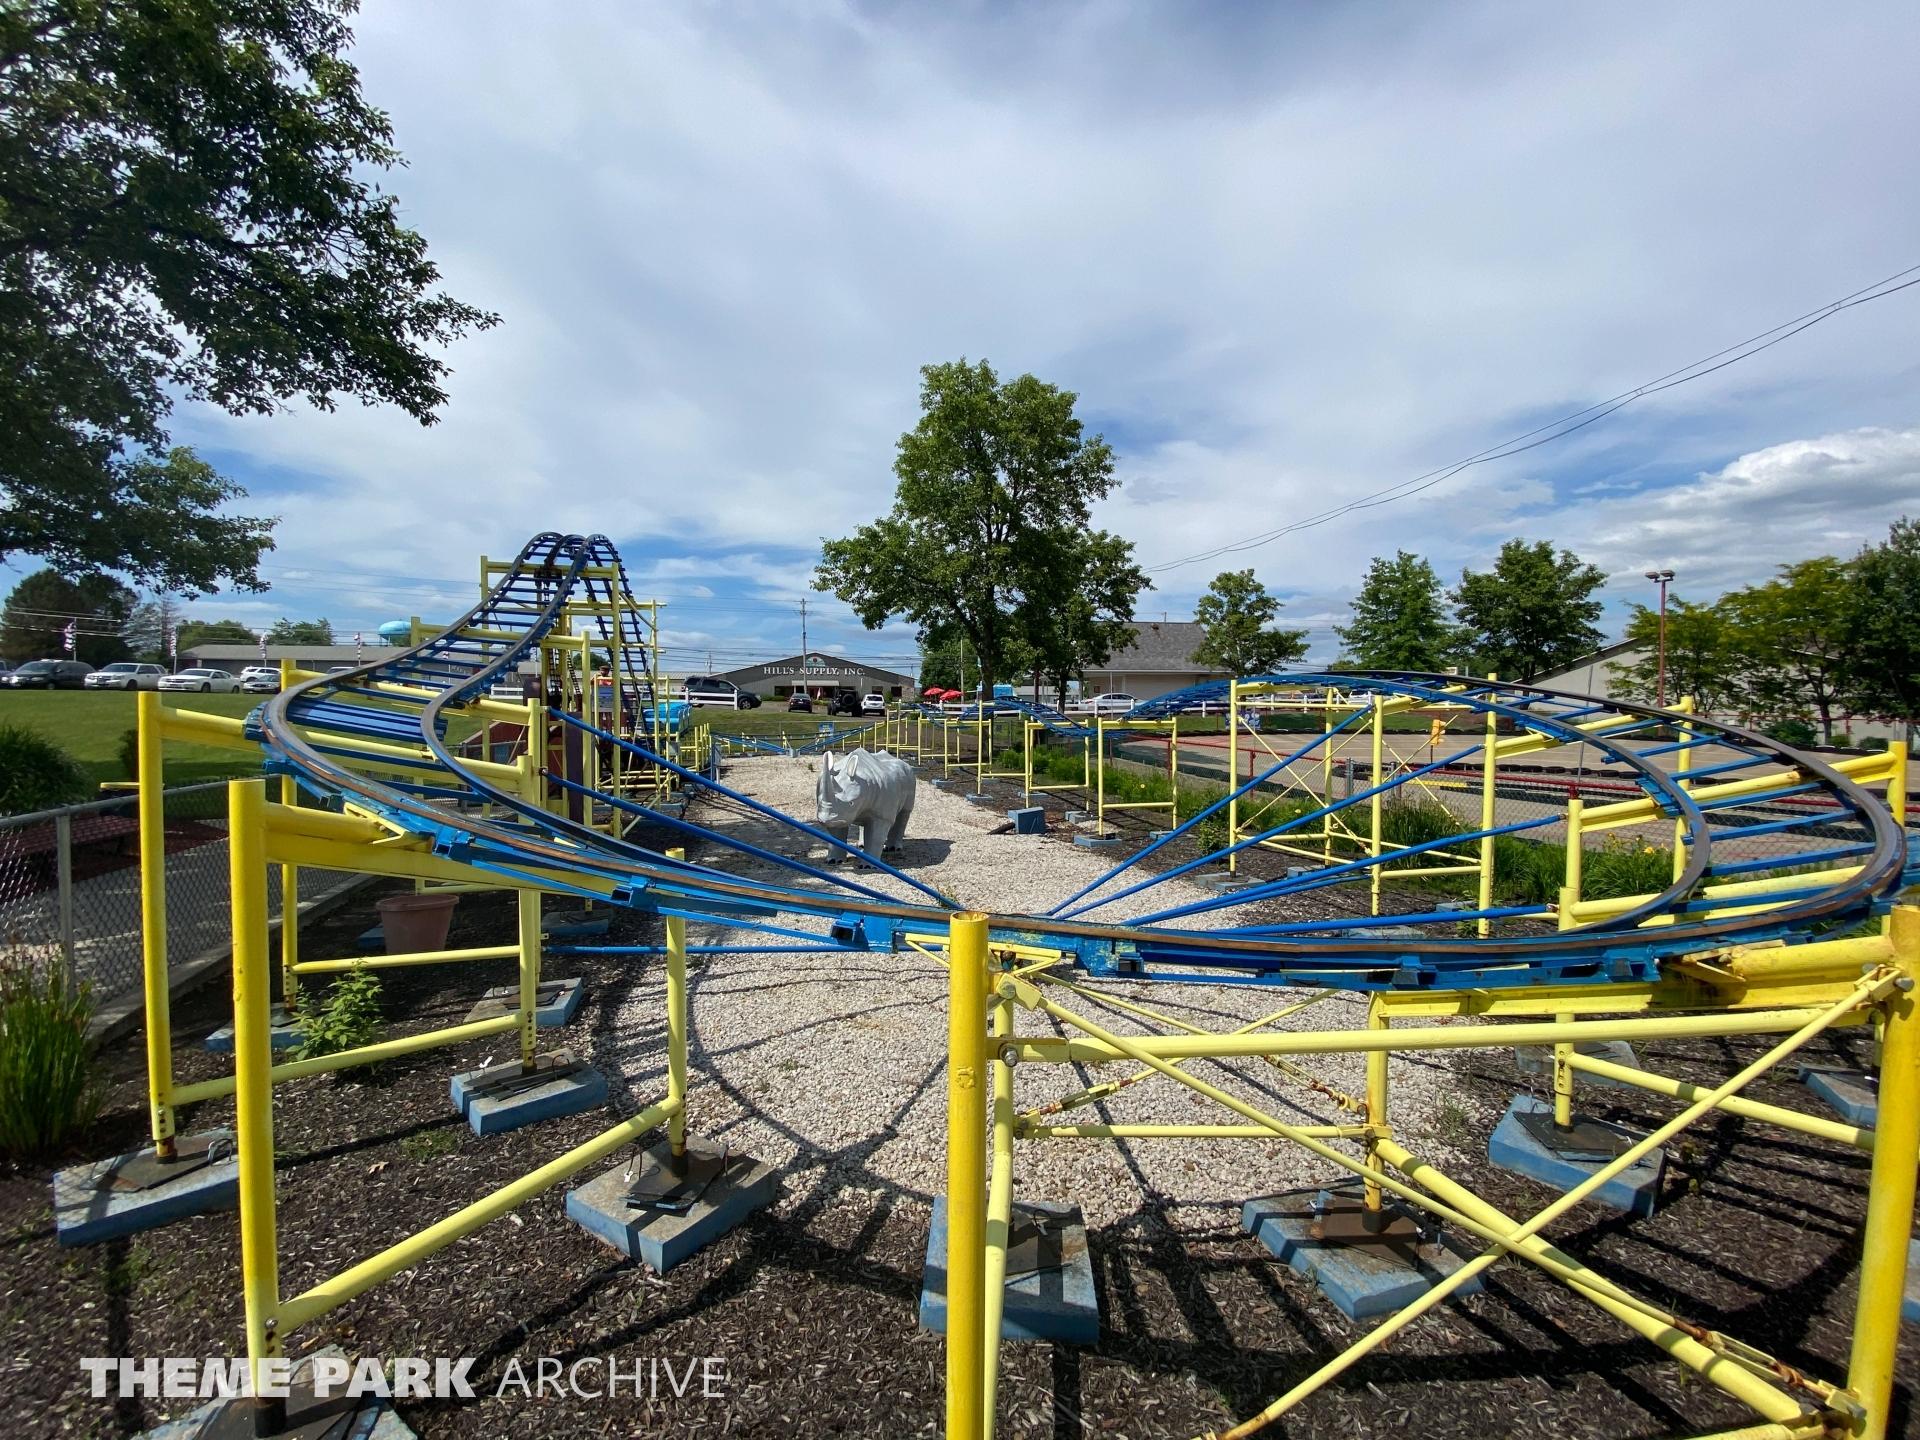 Lil Dipper Roller Coaster at Sluggers & Putters Amusement Park